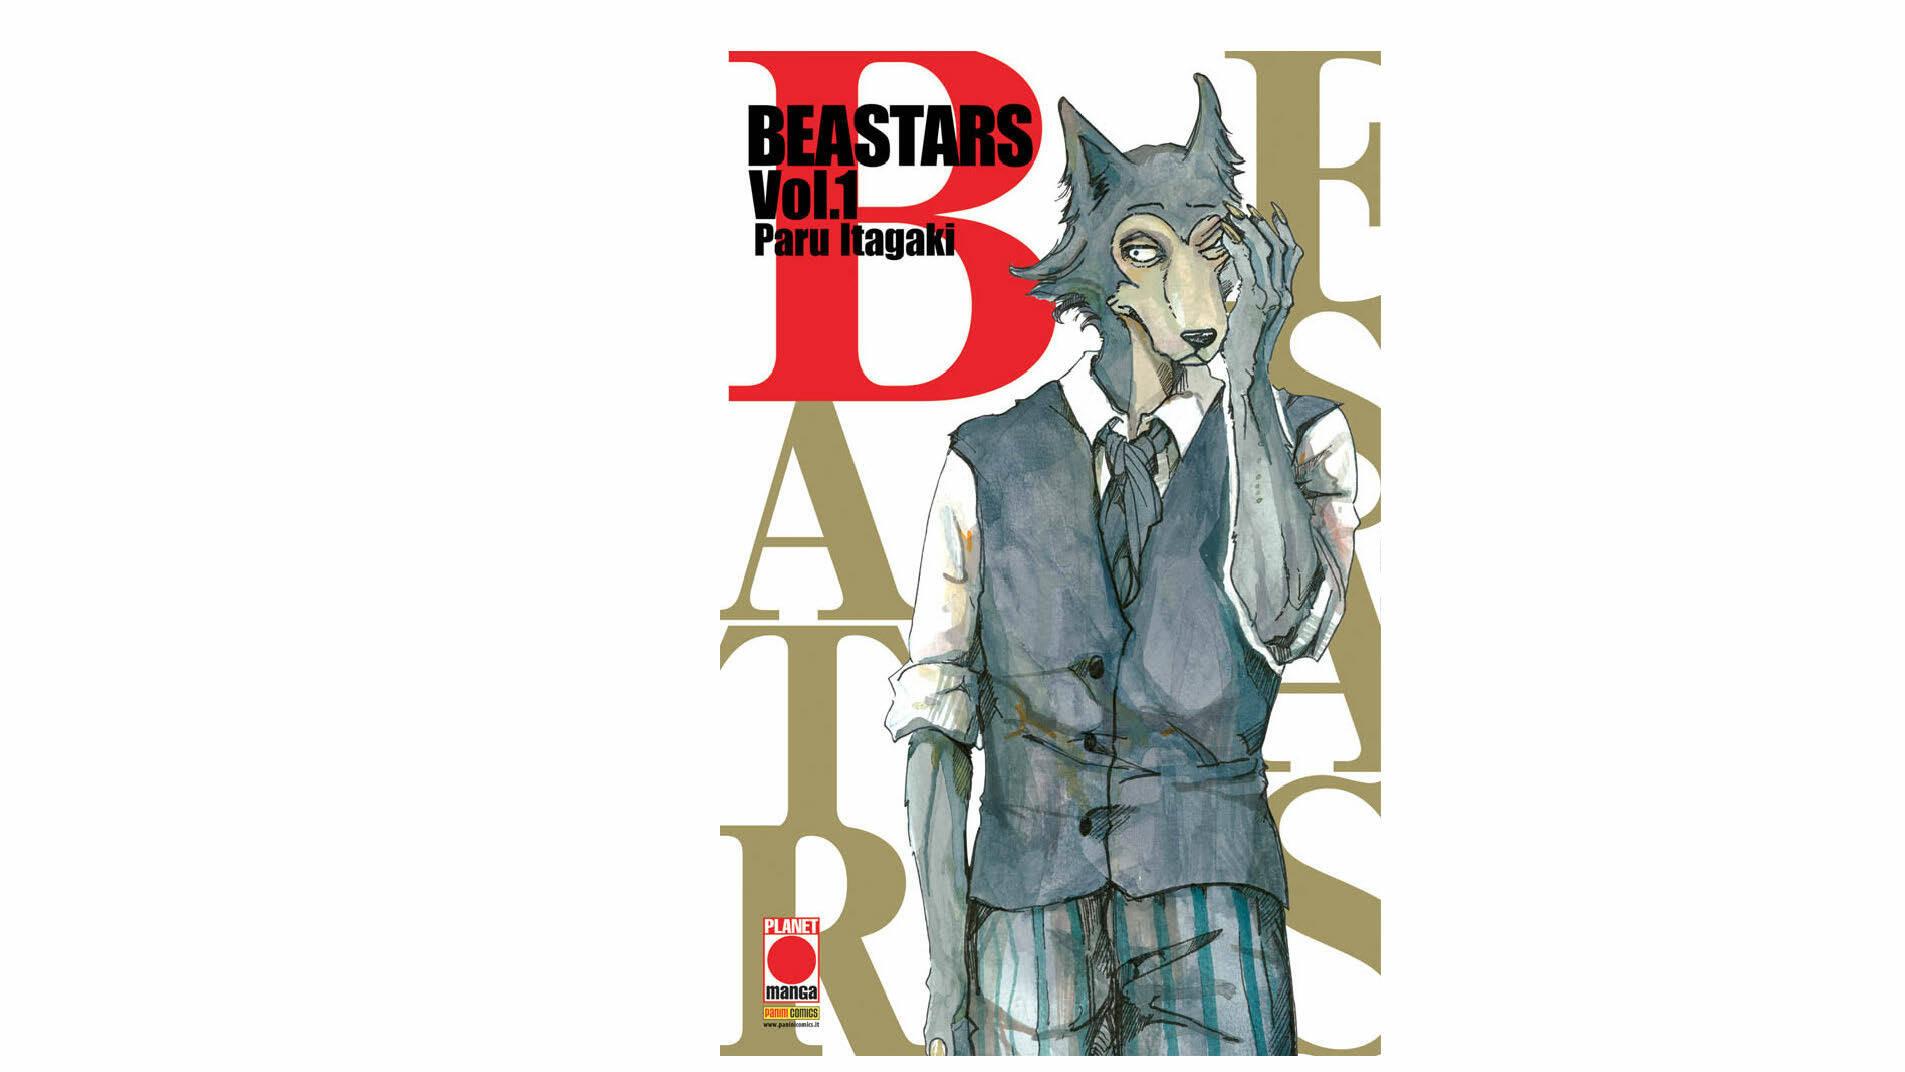 Beastars